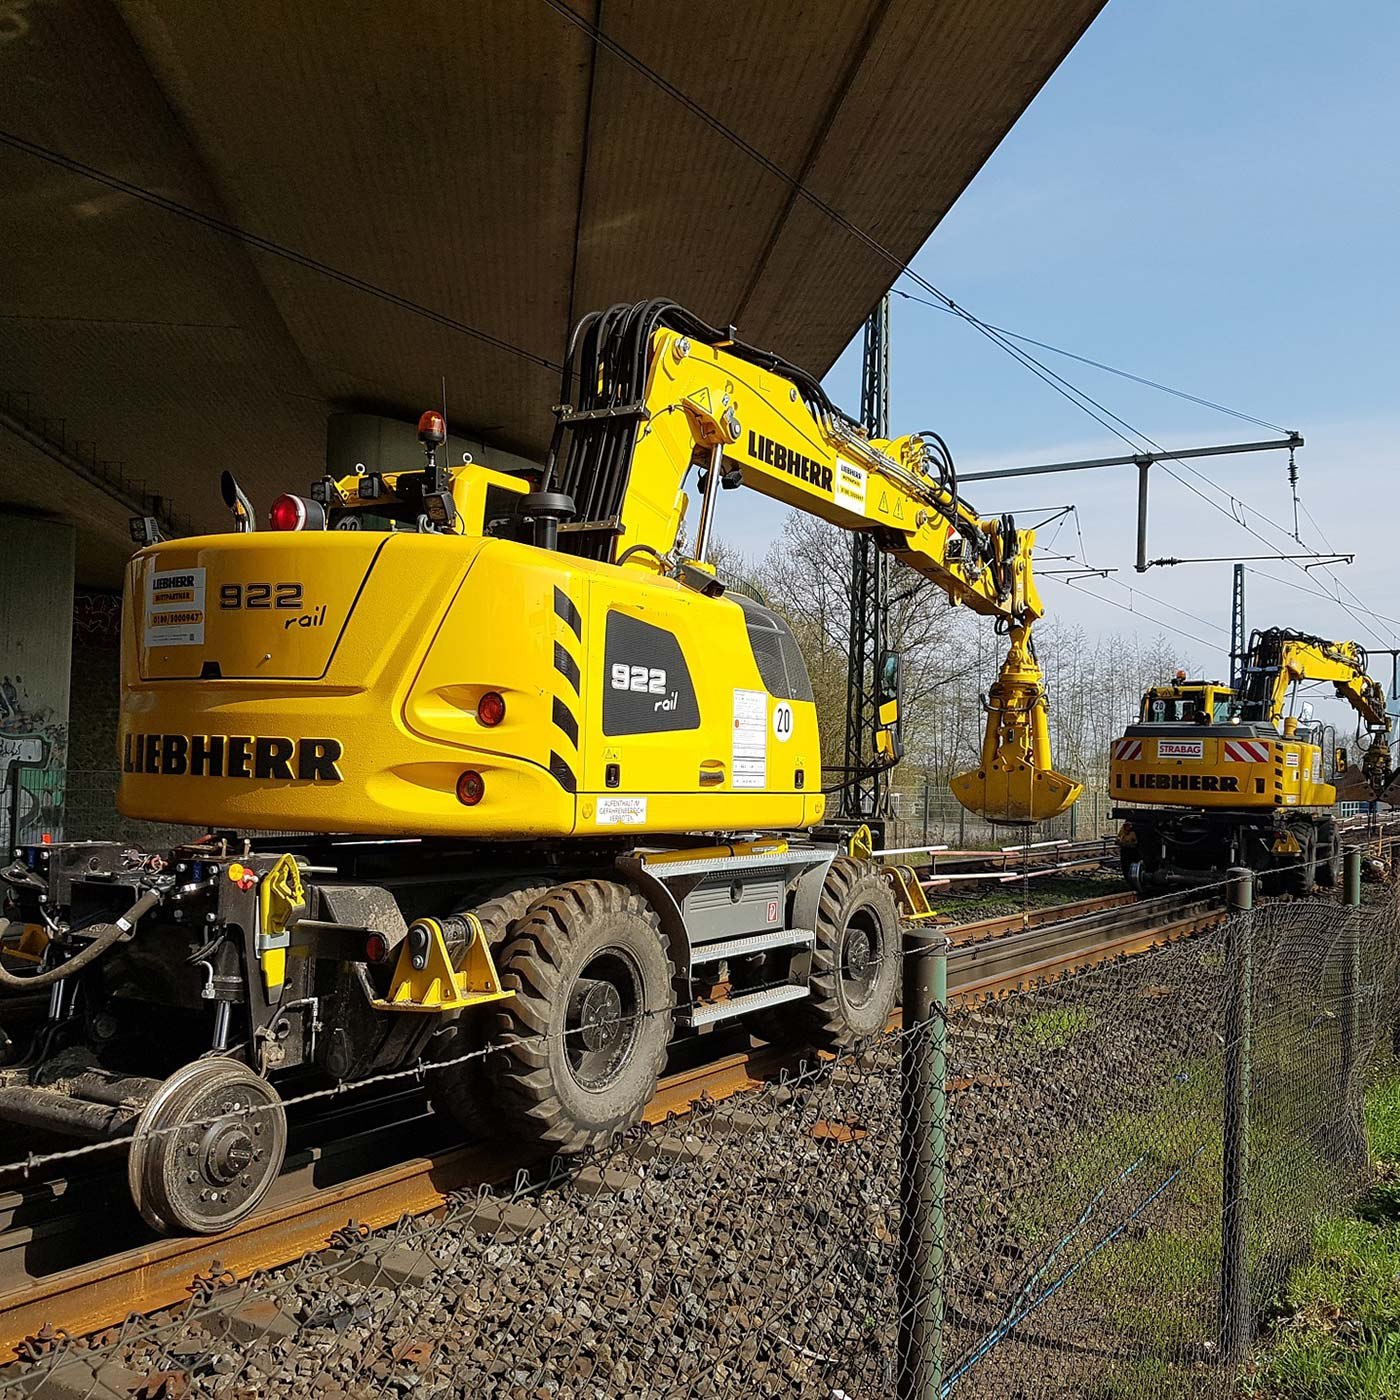 vuolo-group-train-manufacturers-railway-mechanical-processing-operations_1